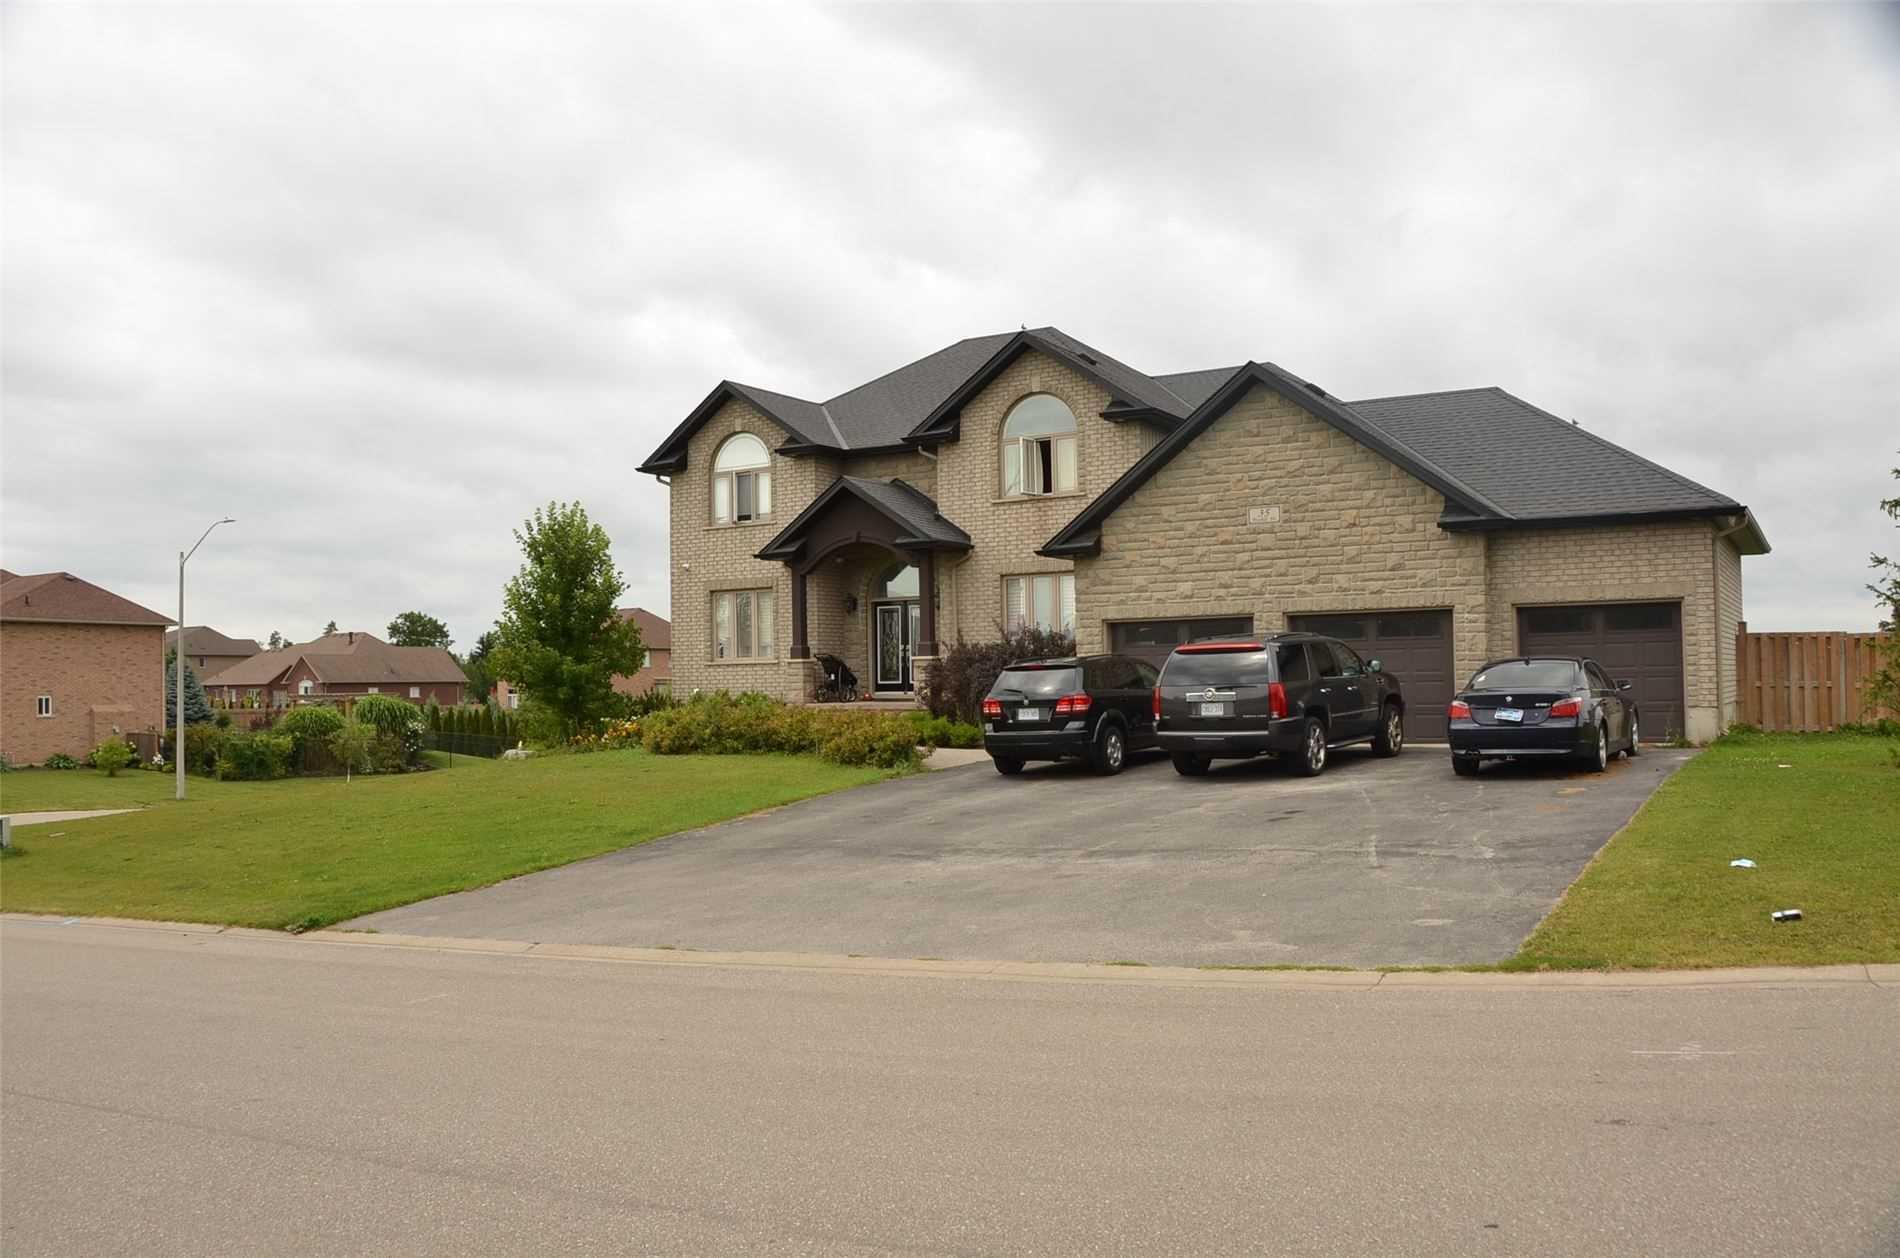 35 Pinehill Dr, Brantford, Ontario N3T 5Z7, 4 Bedrooms Bedrooms, 8 Rooms Rooms,4 BathroomsBathrooms,Detached,For Sale,Pinehill,X5350364